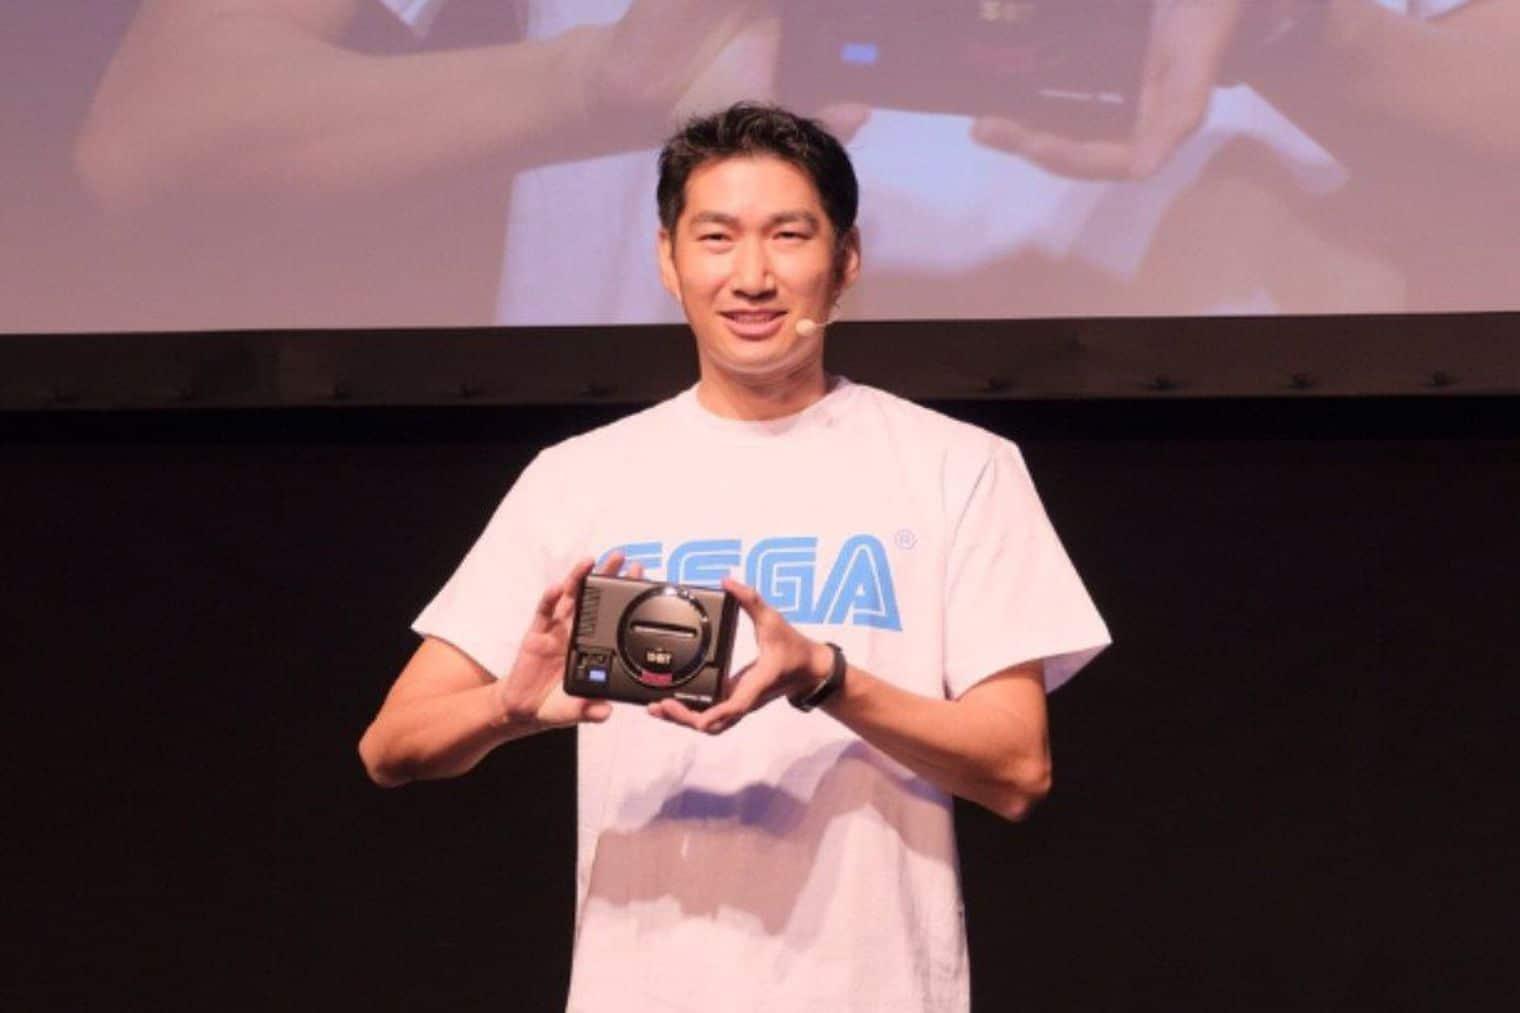 SEGA Mega Drive Mini: Offizielle Schrumpf-Konsole zum Jubiläum